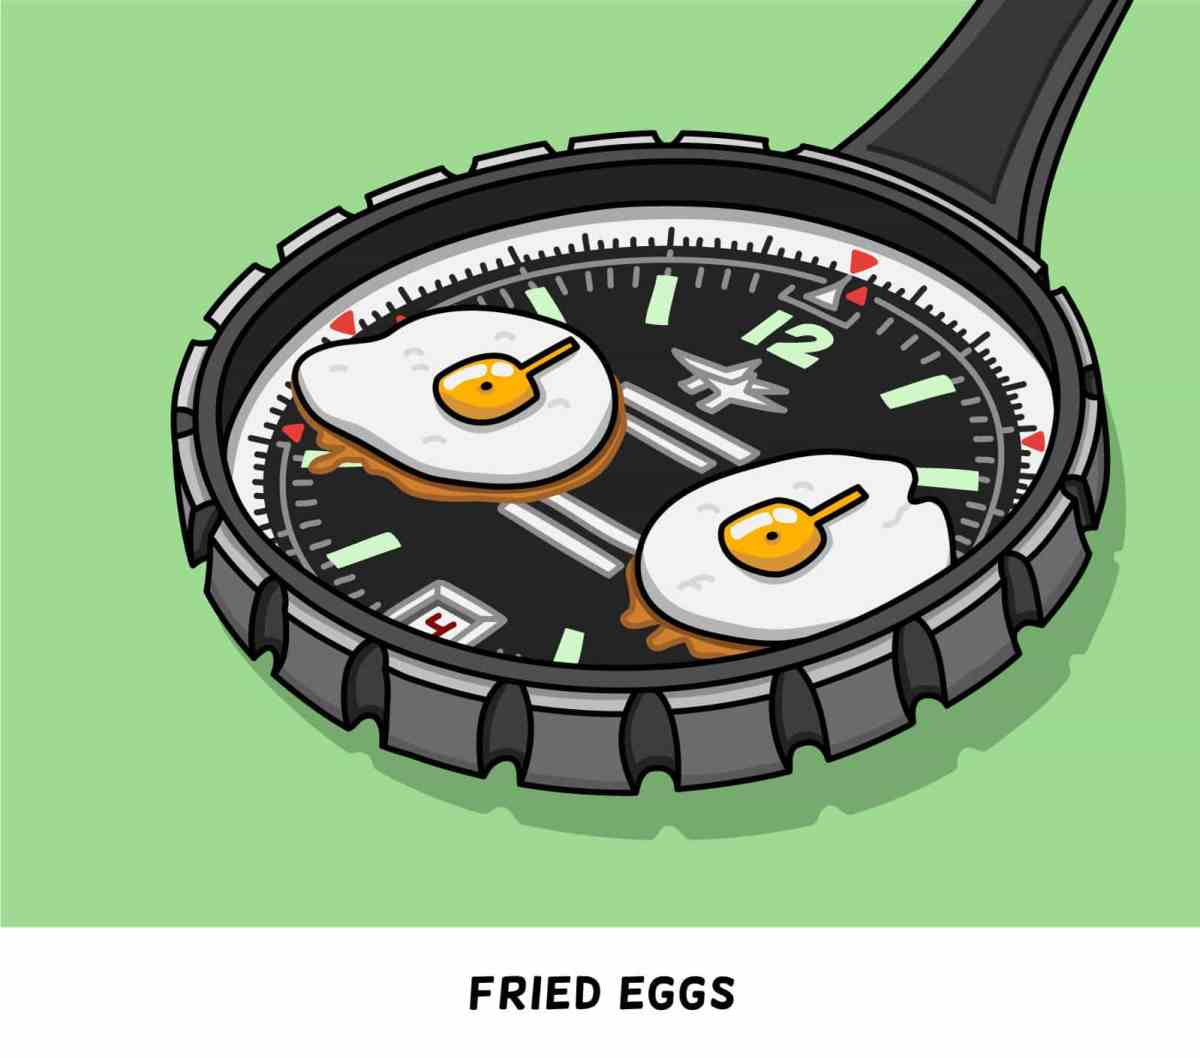 Breitling 1806 - Fried Egg